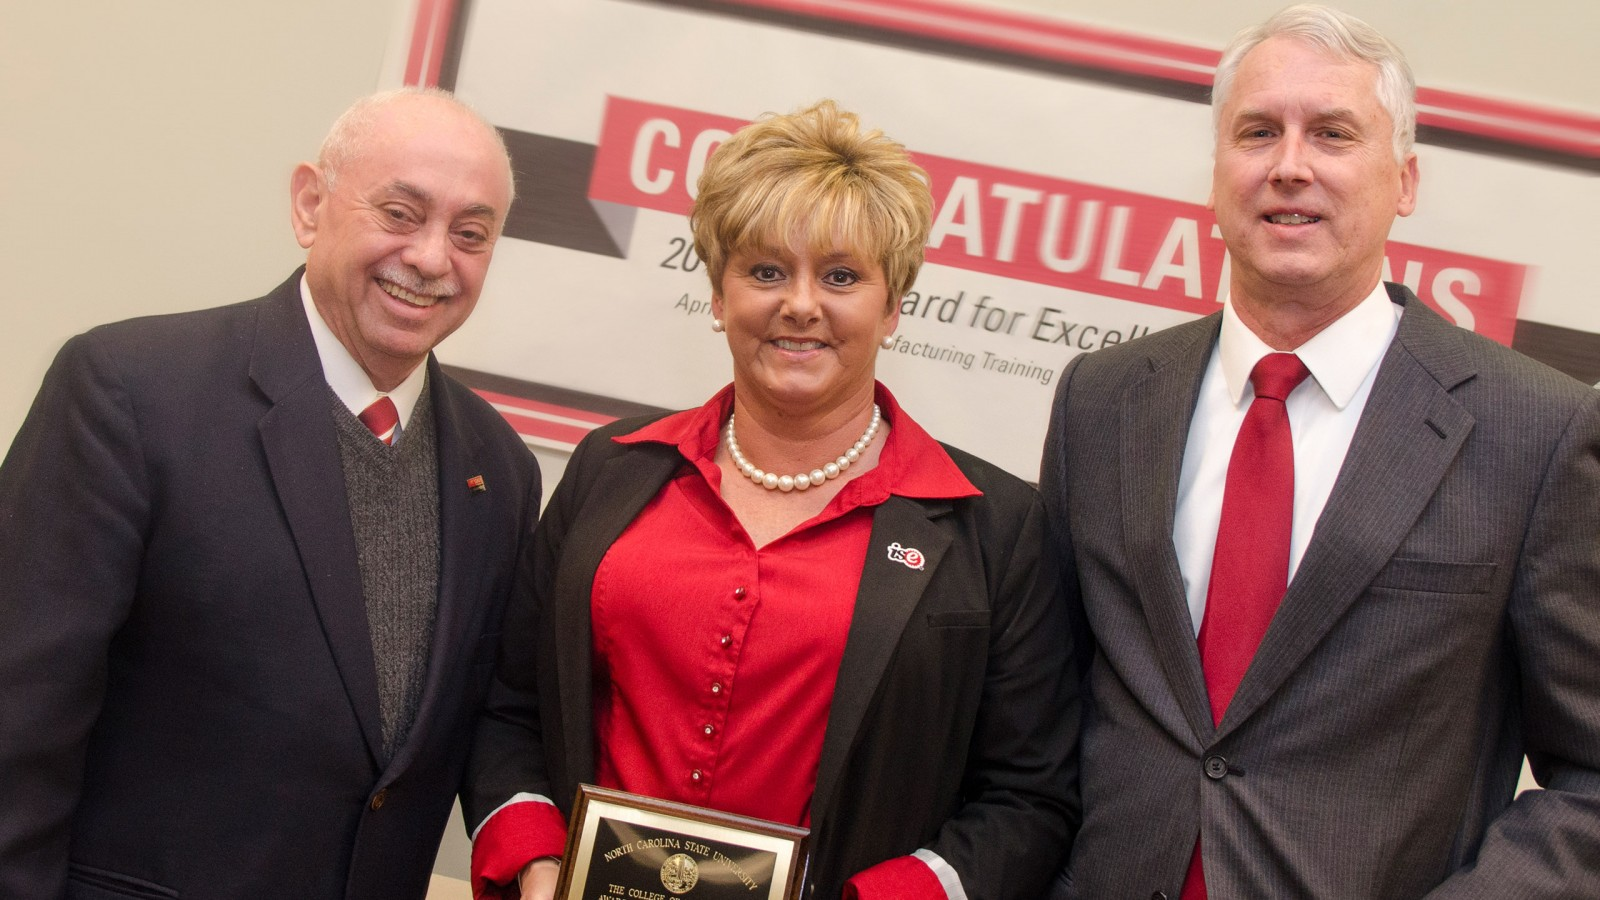 Debbie Allgood-Staton - COE Award